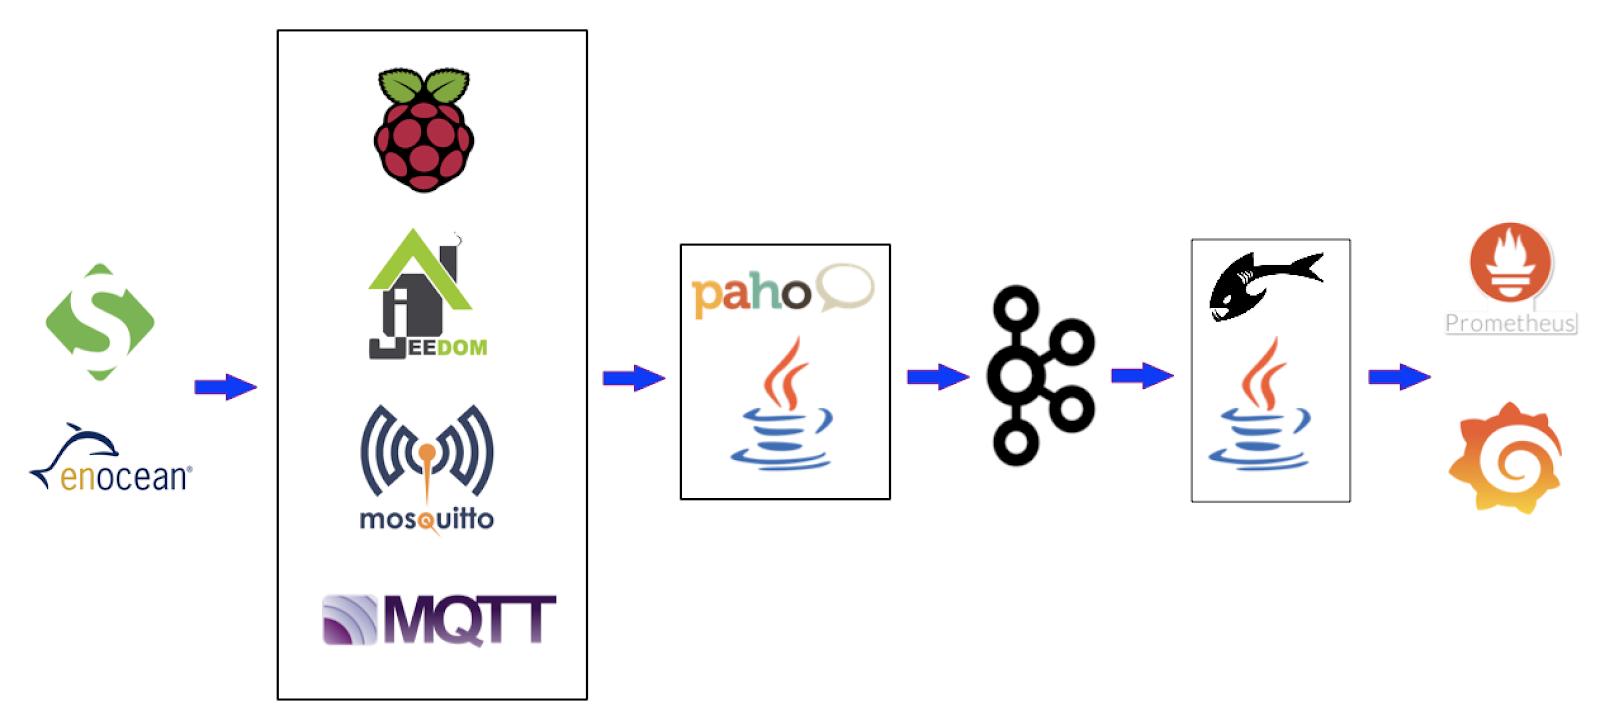 Maxence's technical corner: IoT / SmartHome - Send EnOcean sensor